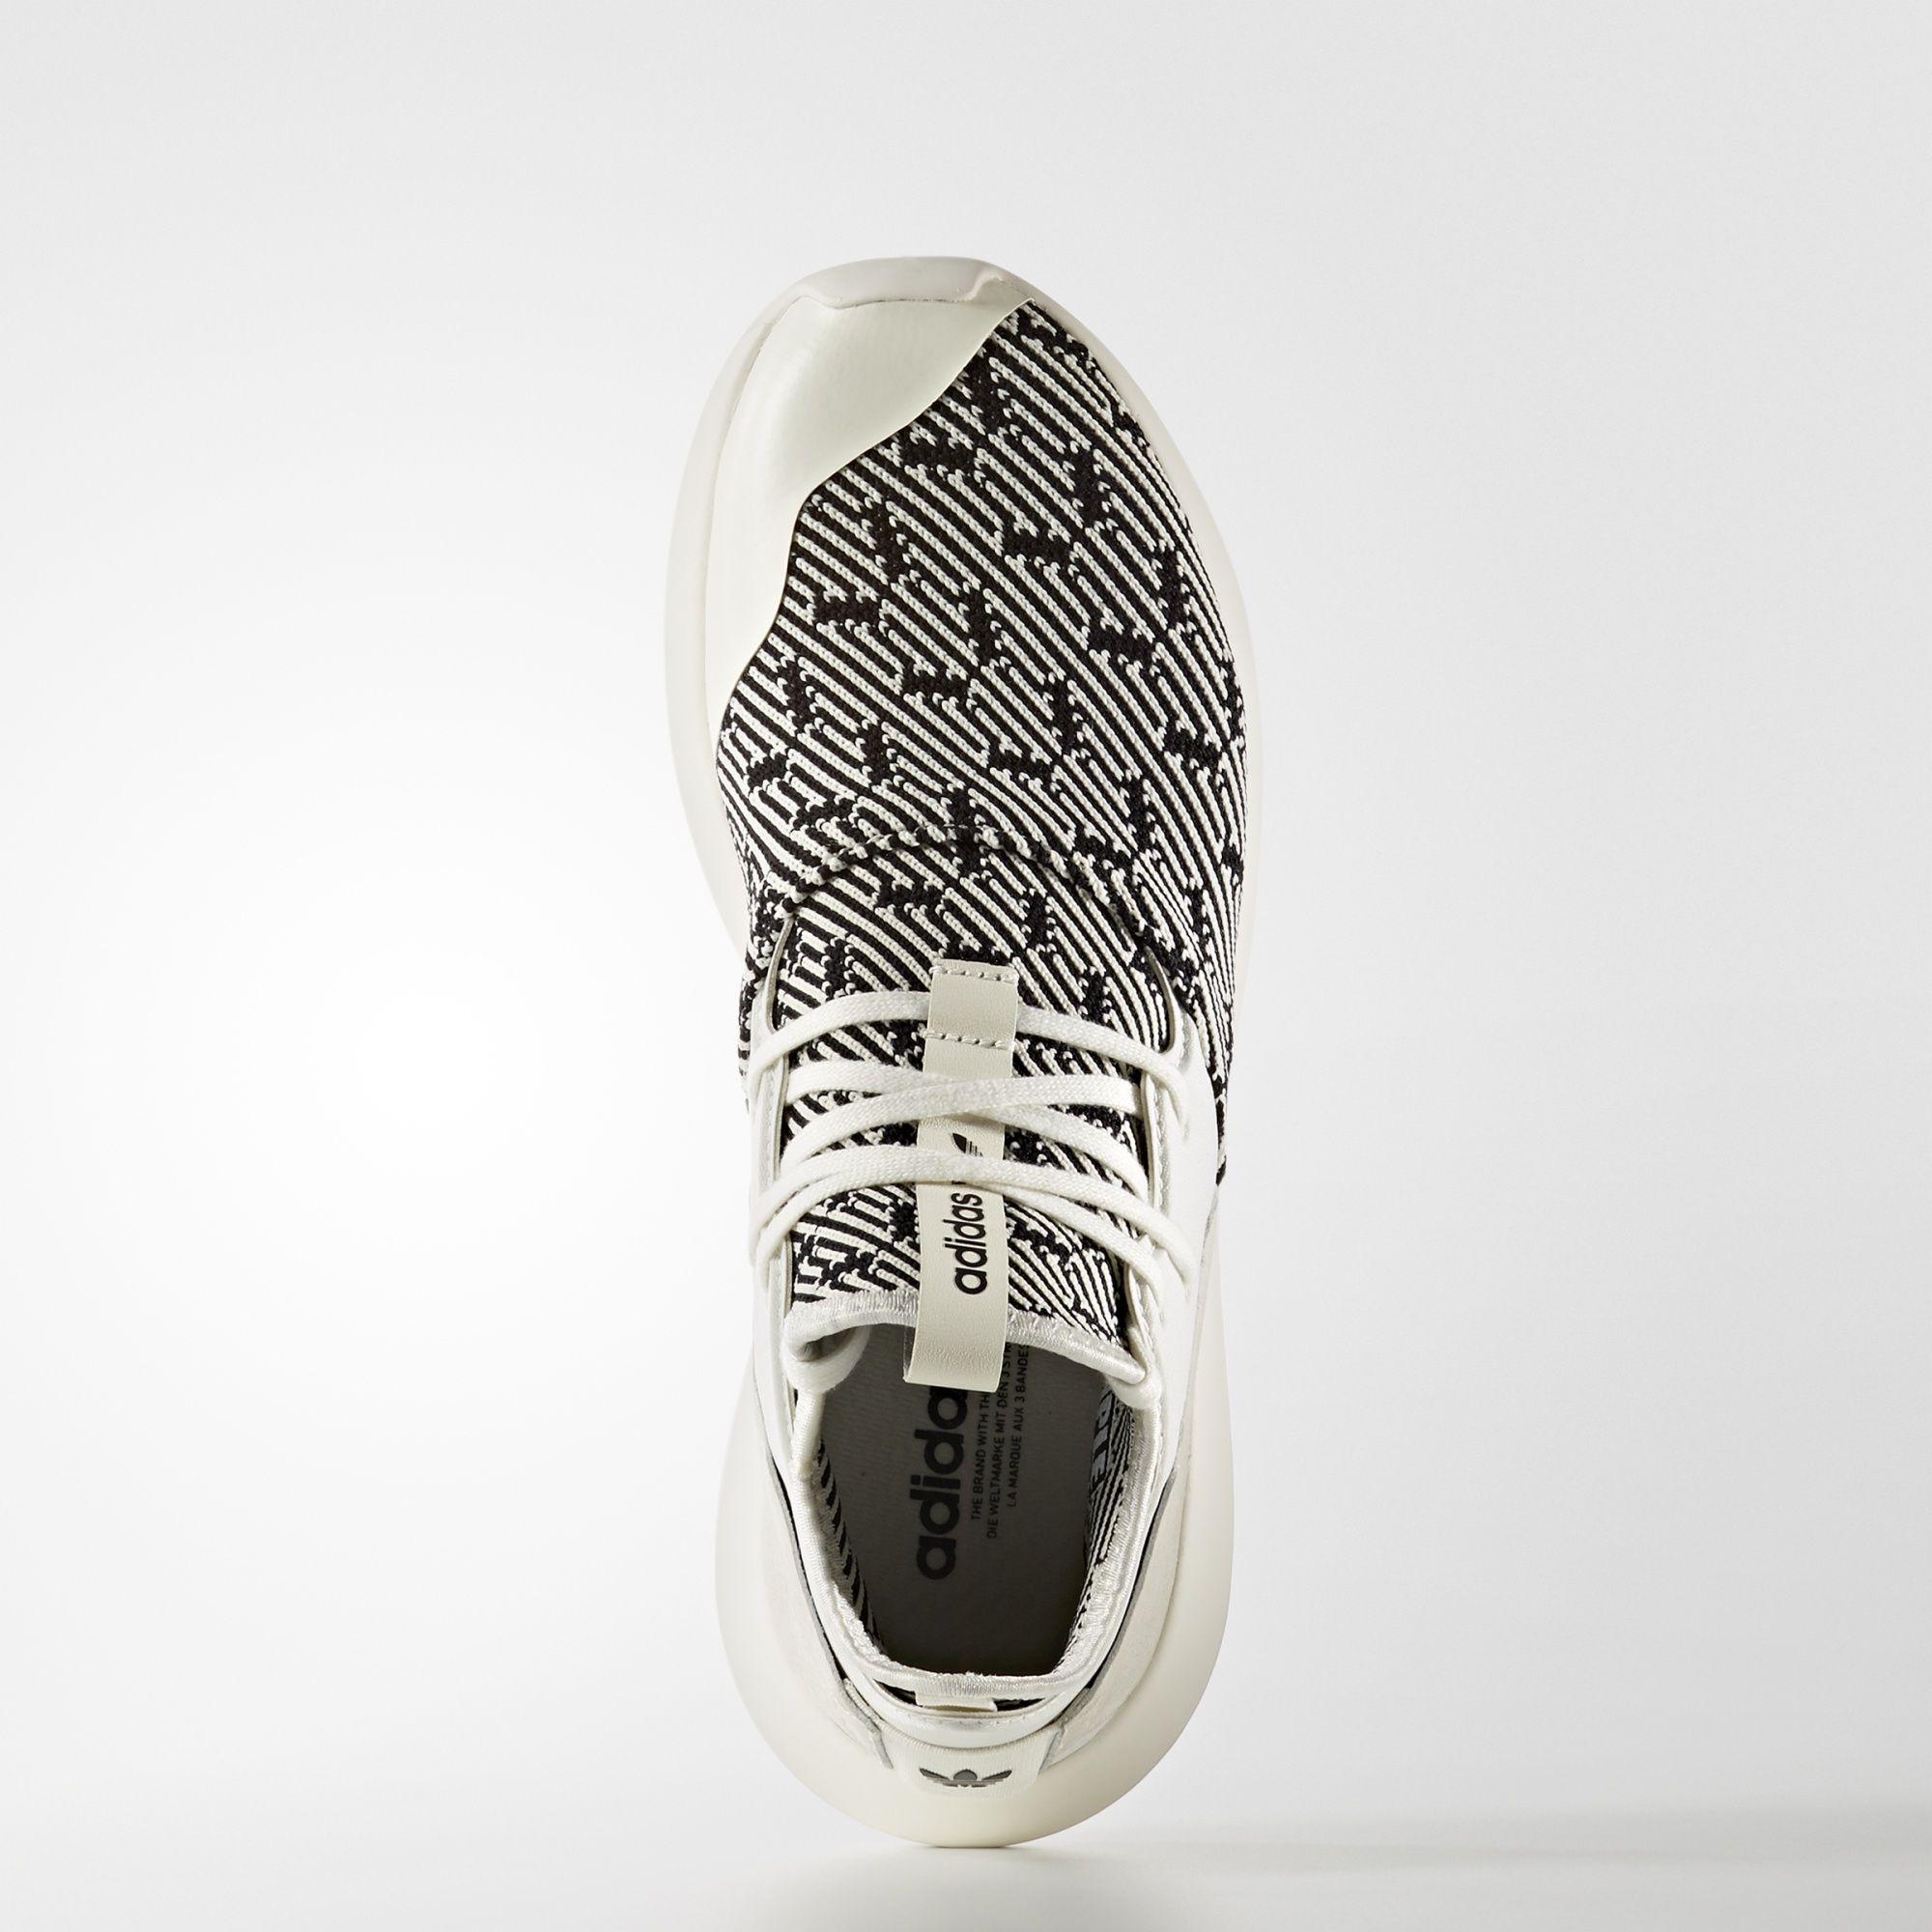 6e2a808ae0ad Women s adidas Originals Tubular Entrap Primeknit 6 - WearTesters